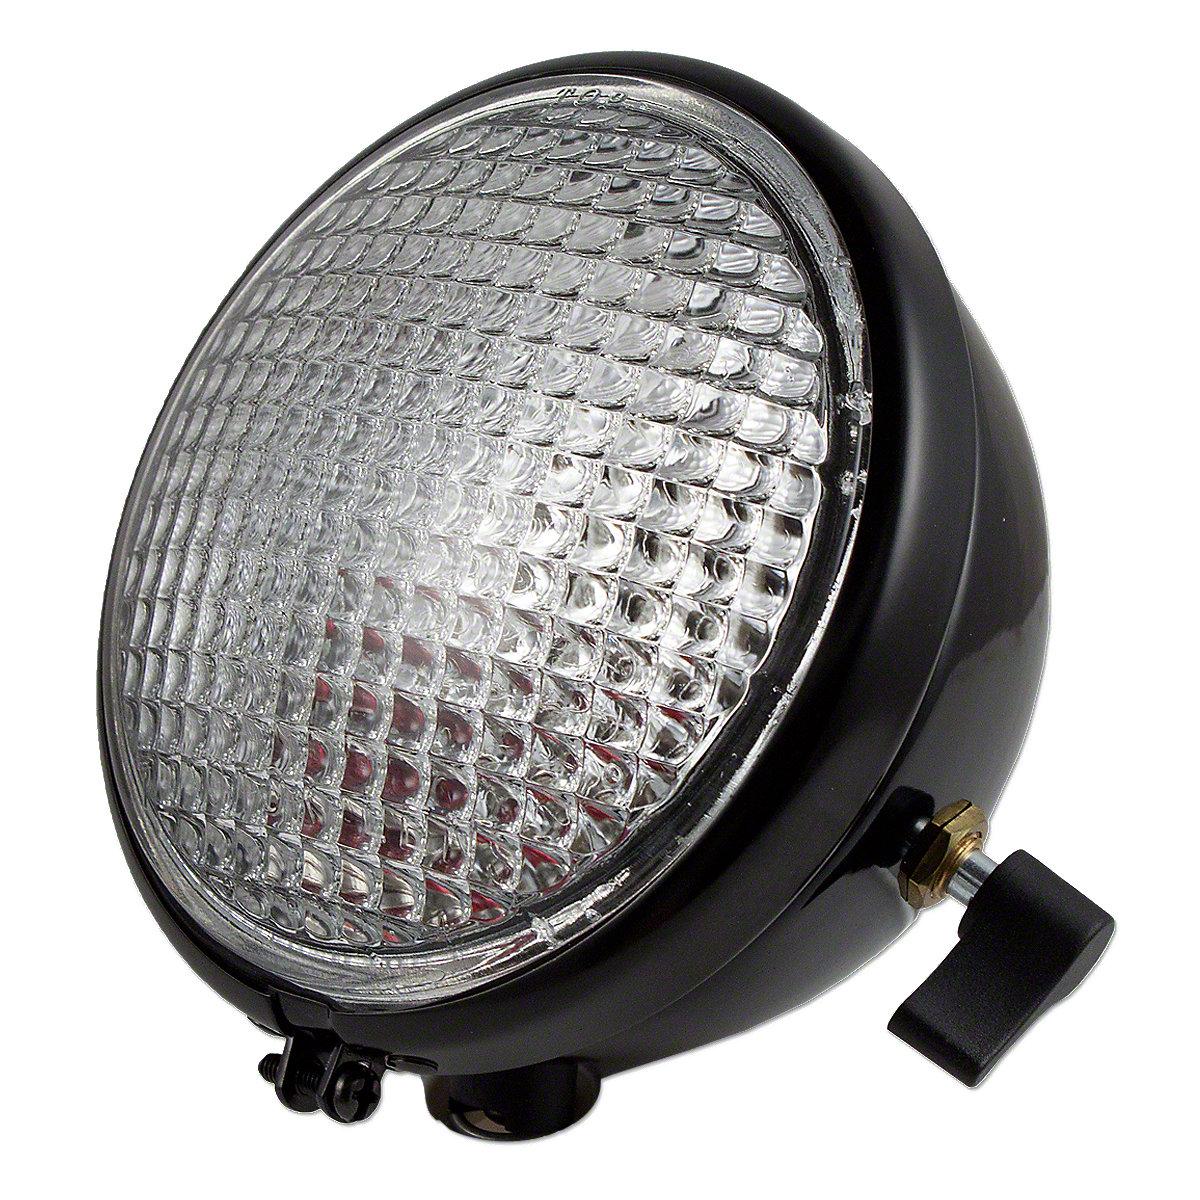 6 Volt Tractor Lights : Jds volt rear combo red dot lamp